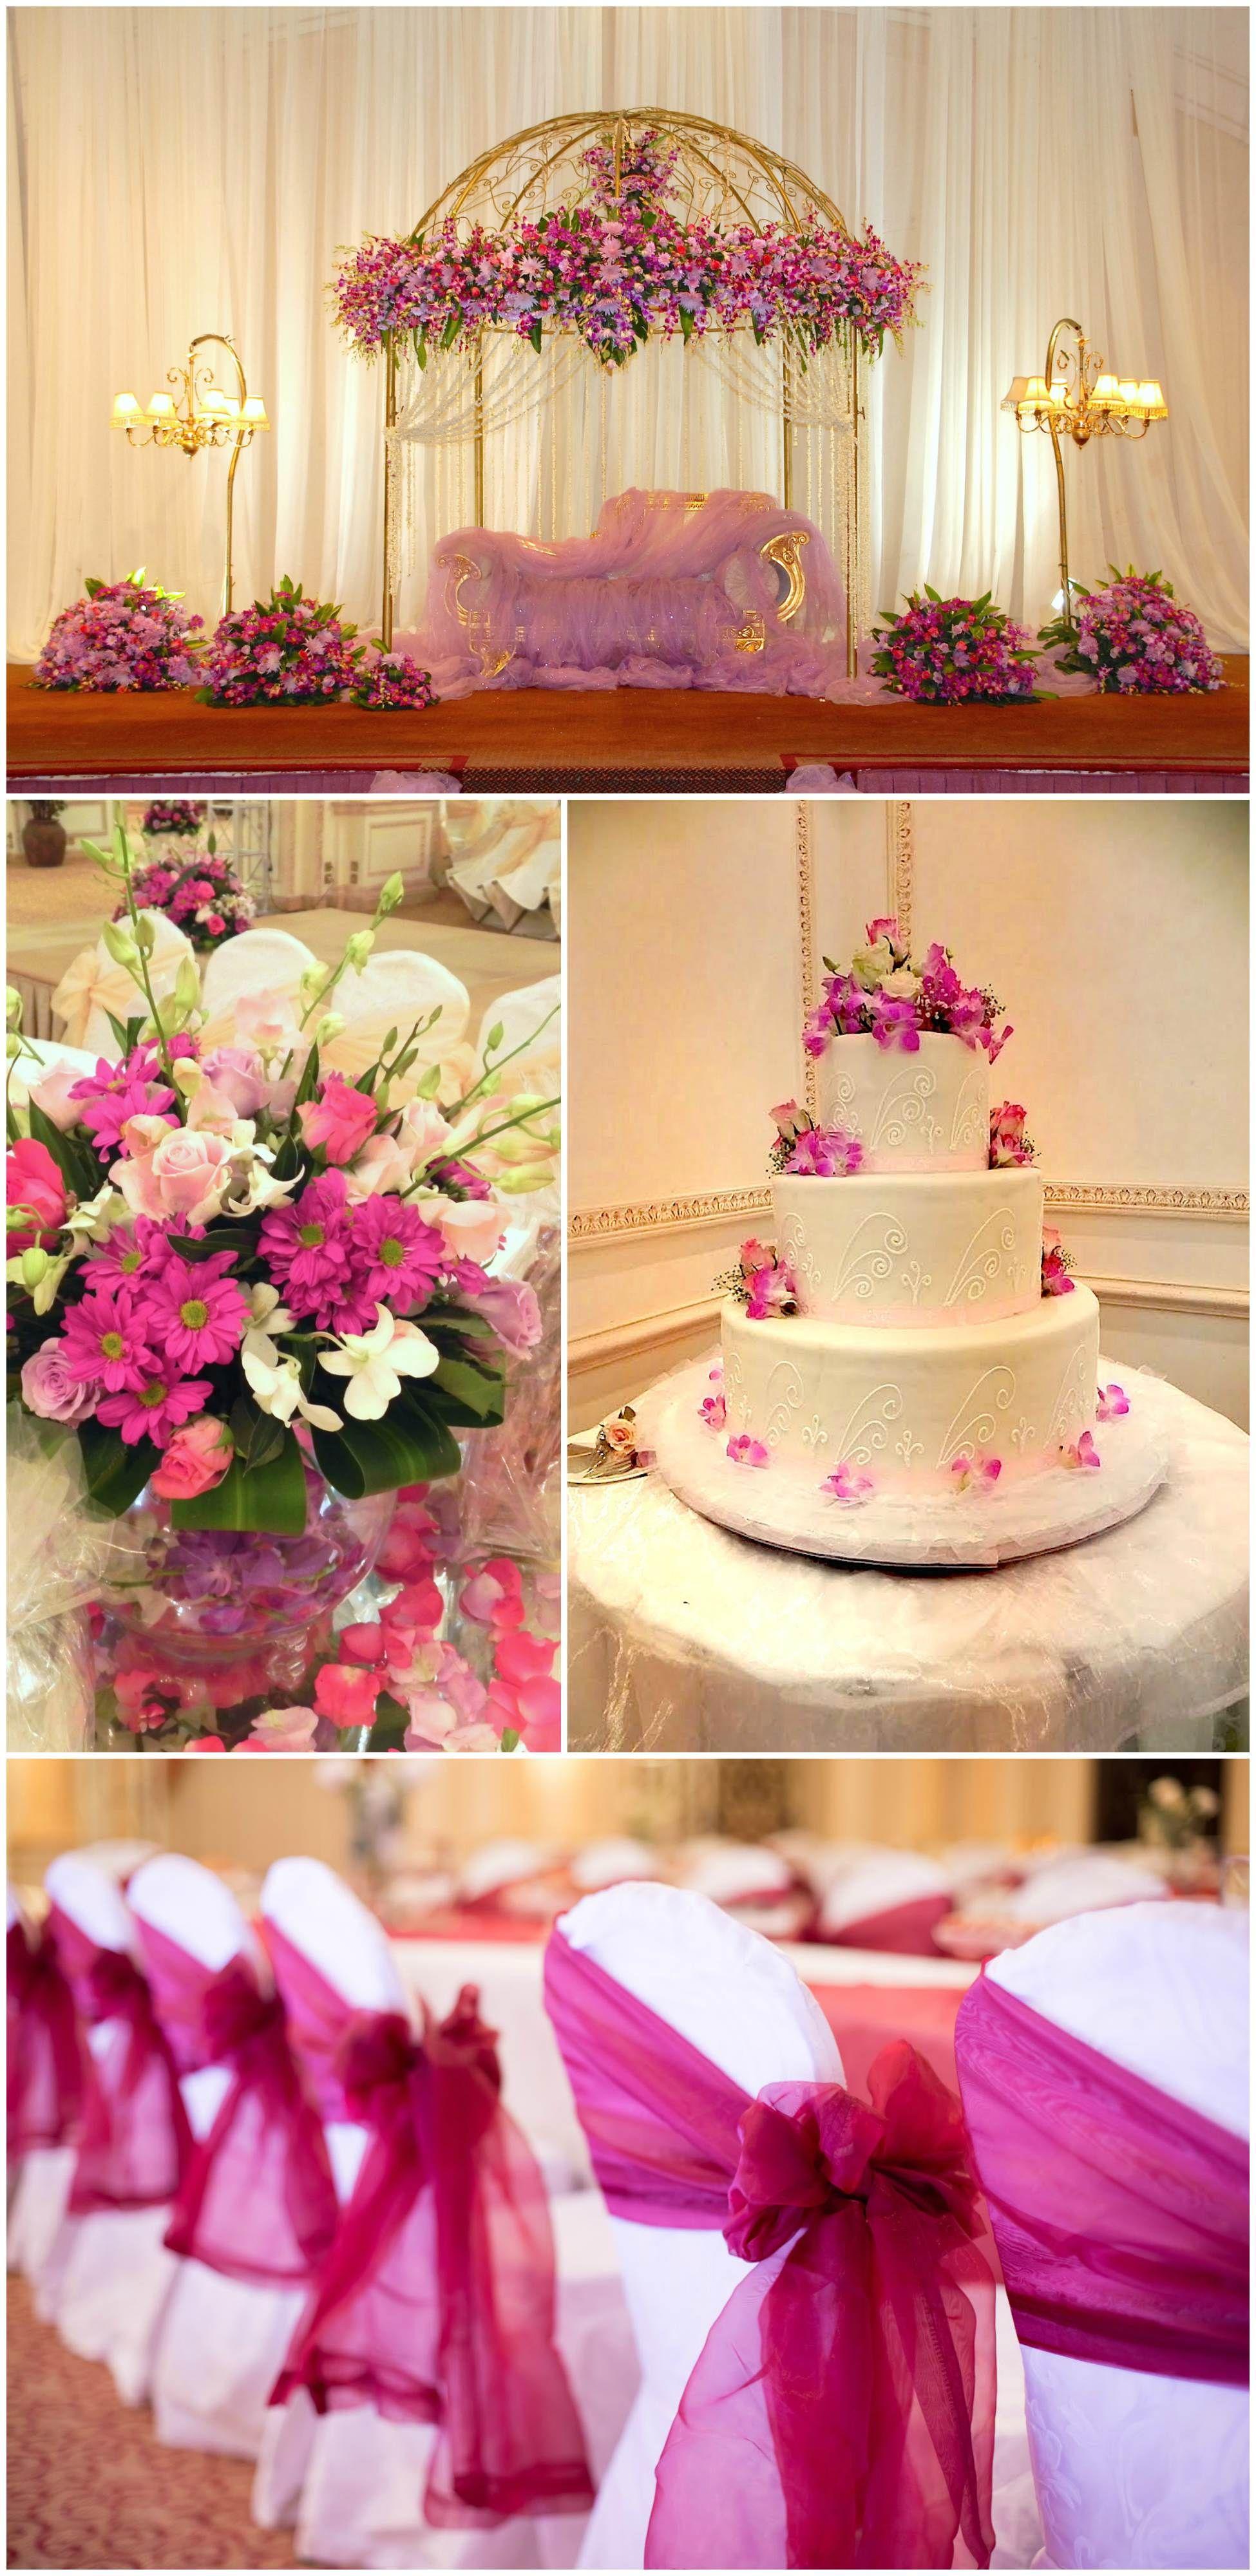 Pink weddings at the sunset hotel jeddah bespoke weddings pink weddings at the sunset hotel jeddah junglespirit Choice Image